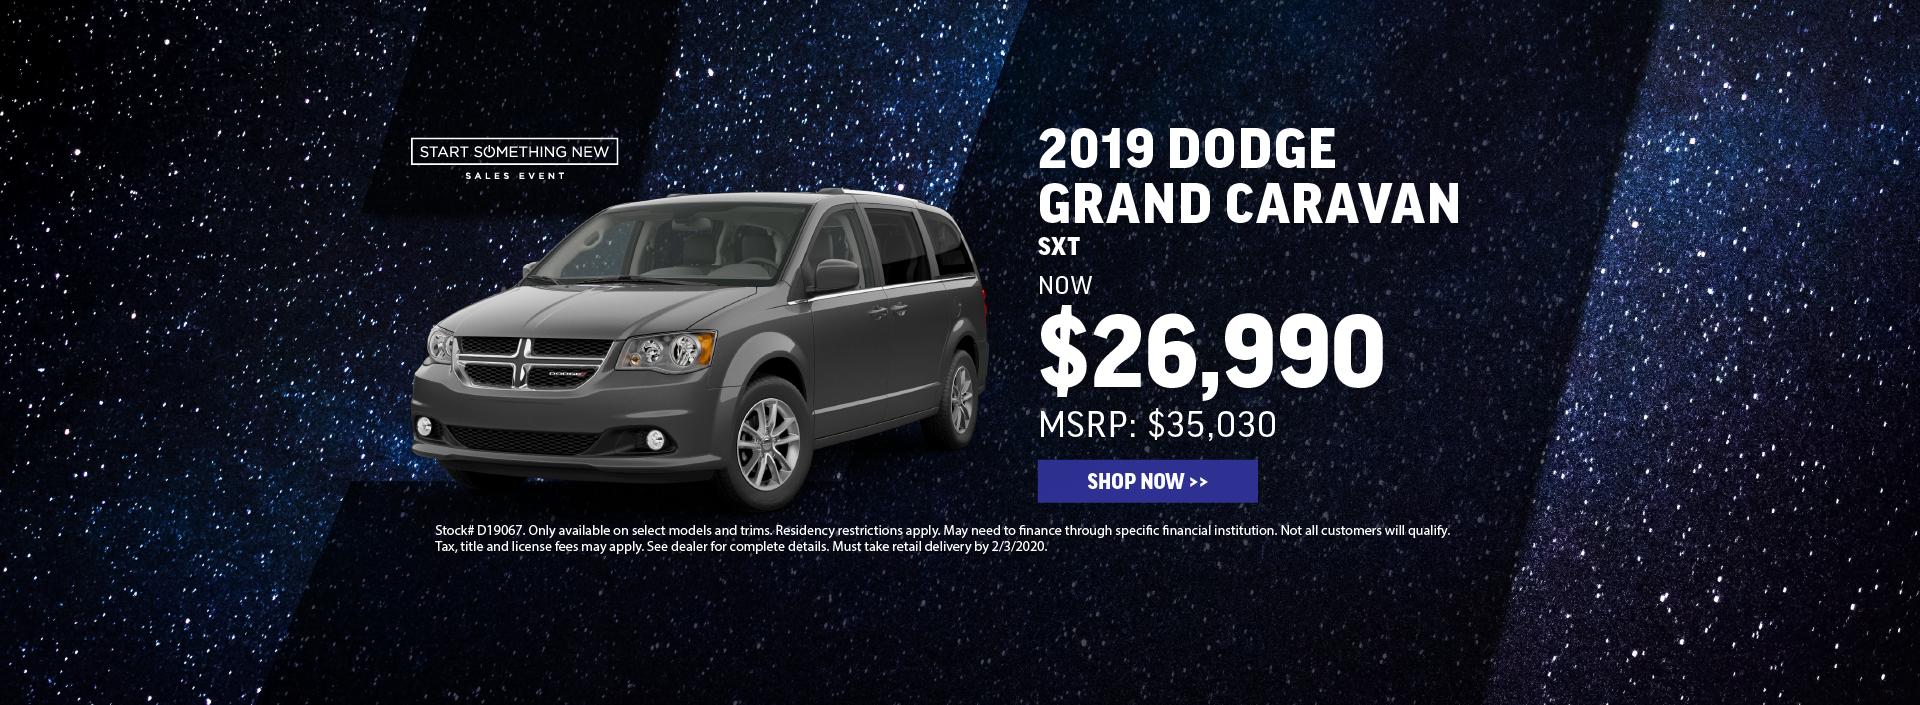 2019 Dodge Grand Caravan Offer